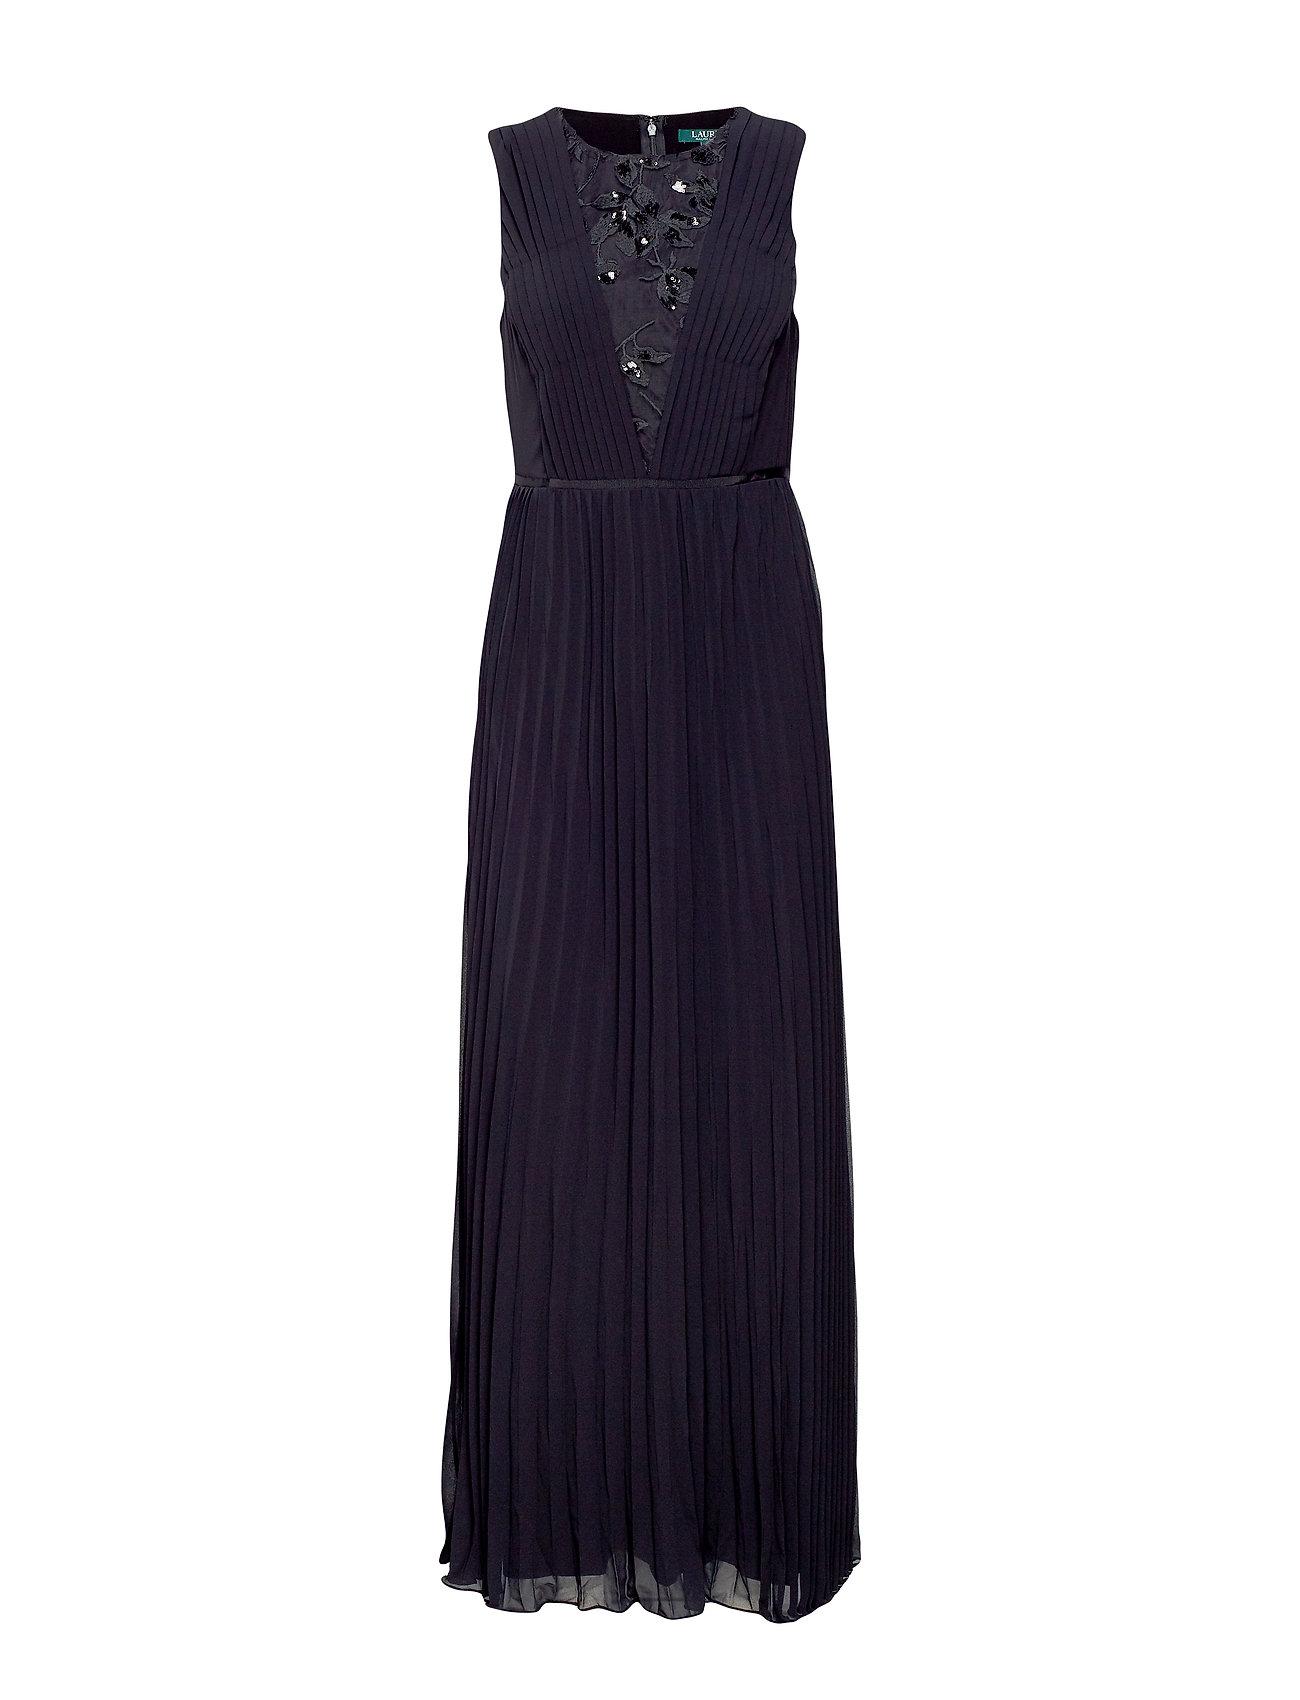 Lauren Ralph Lauren Pleated Chiffon Gown - BLACK/BLACK SHINE